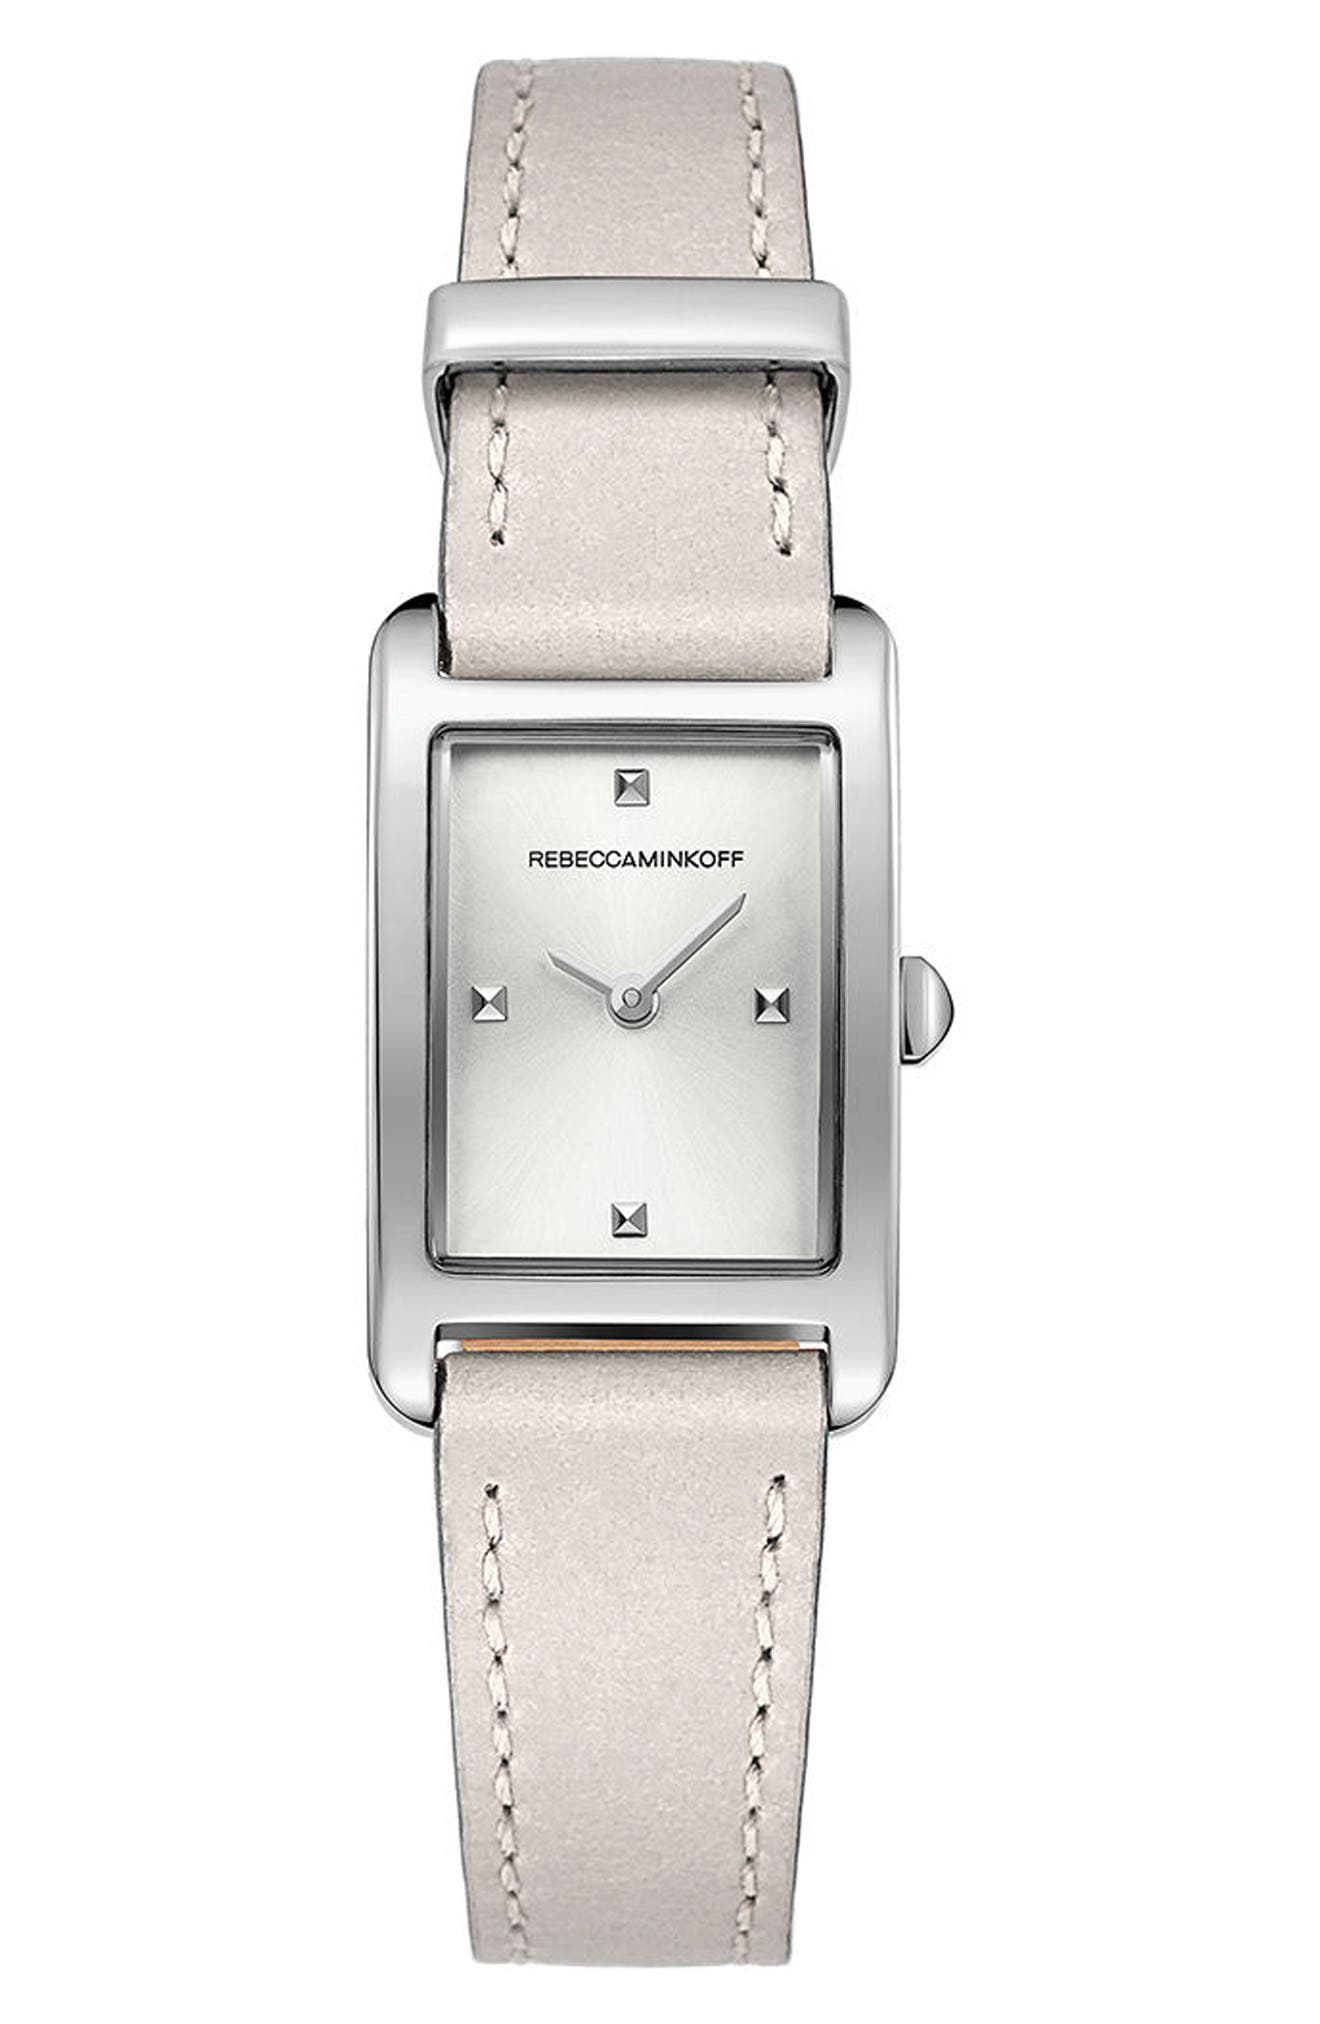 Rebecca Minkoff Moment Leather Strap Watch, 19mm x 30mm